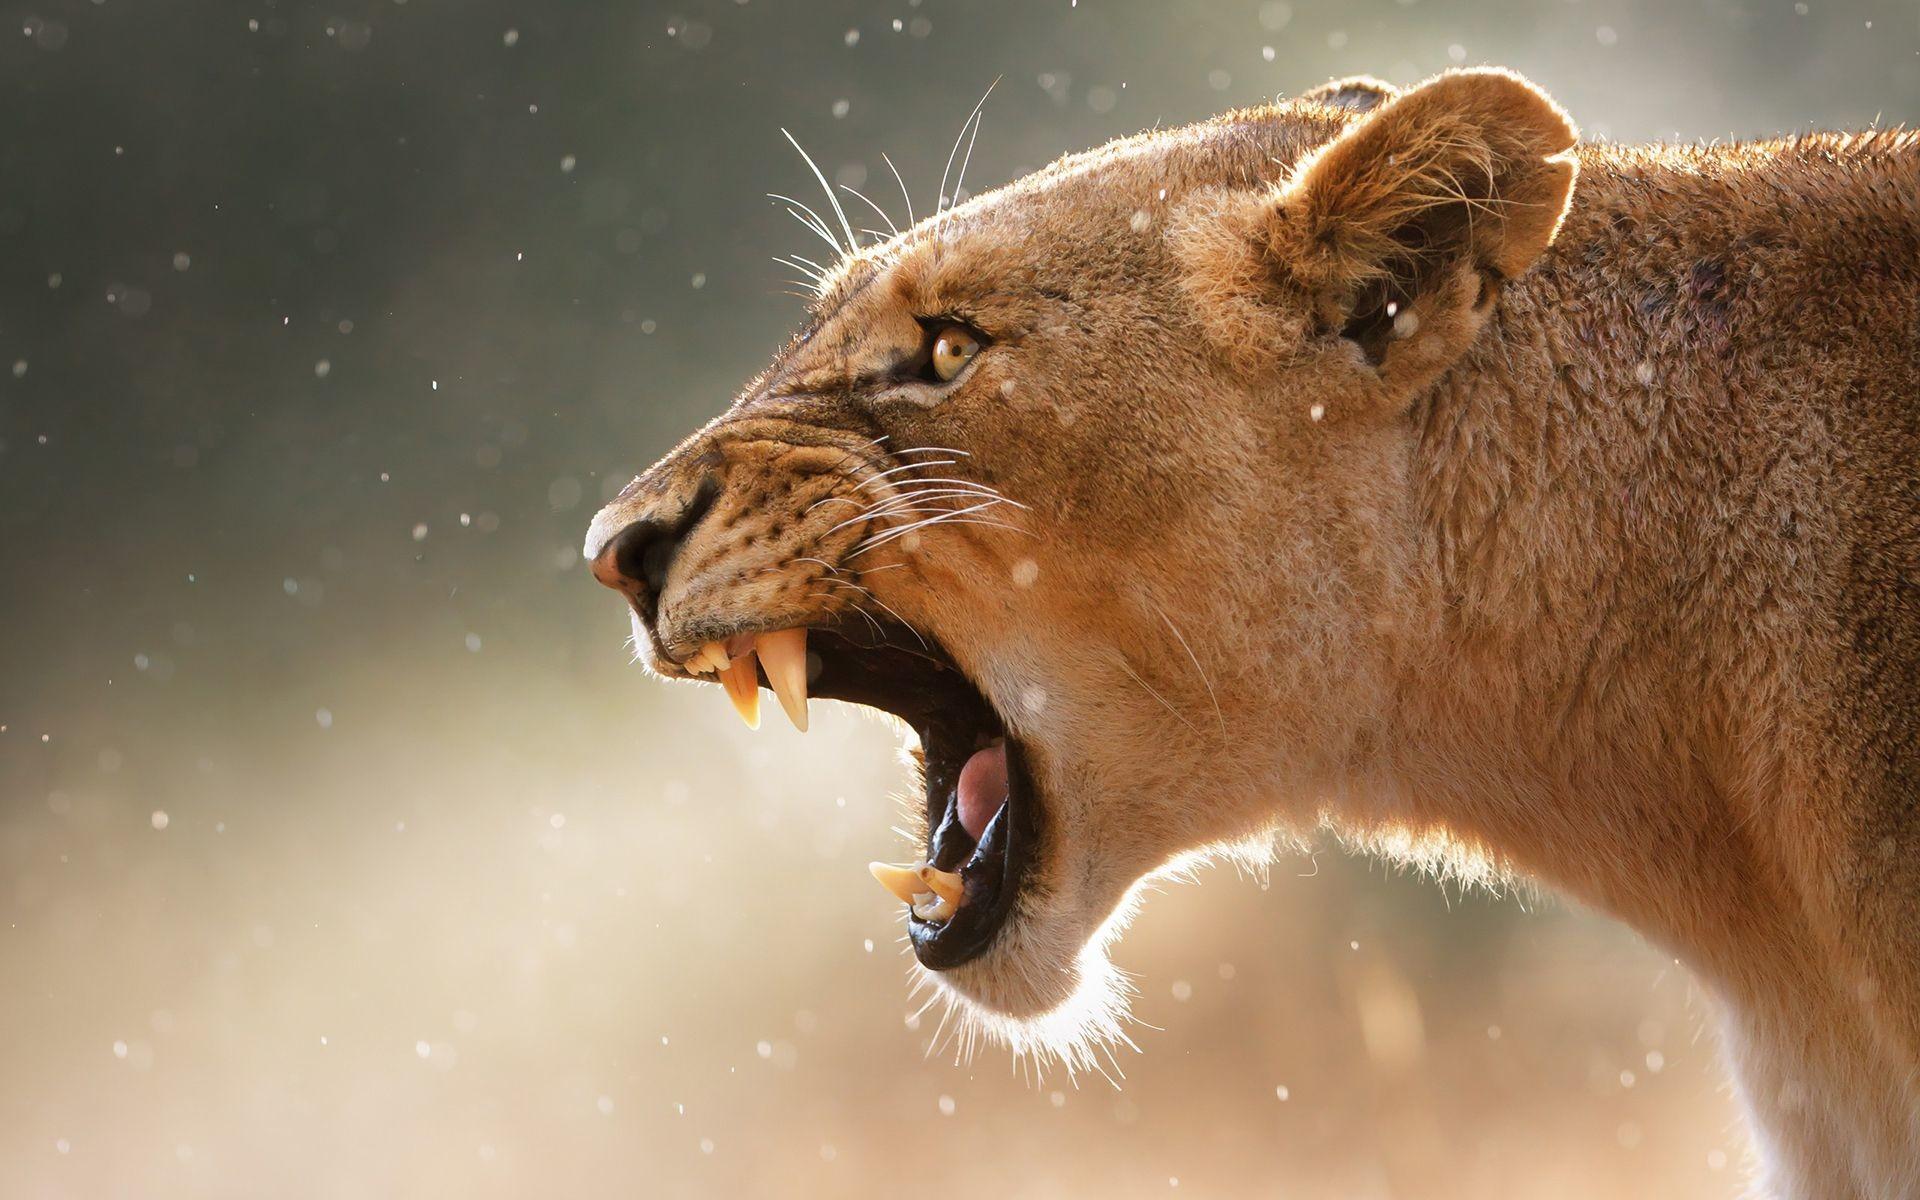 lion roar – Google Search   CATRITTERS   Pinterest   Hd wallpaper and Lions